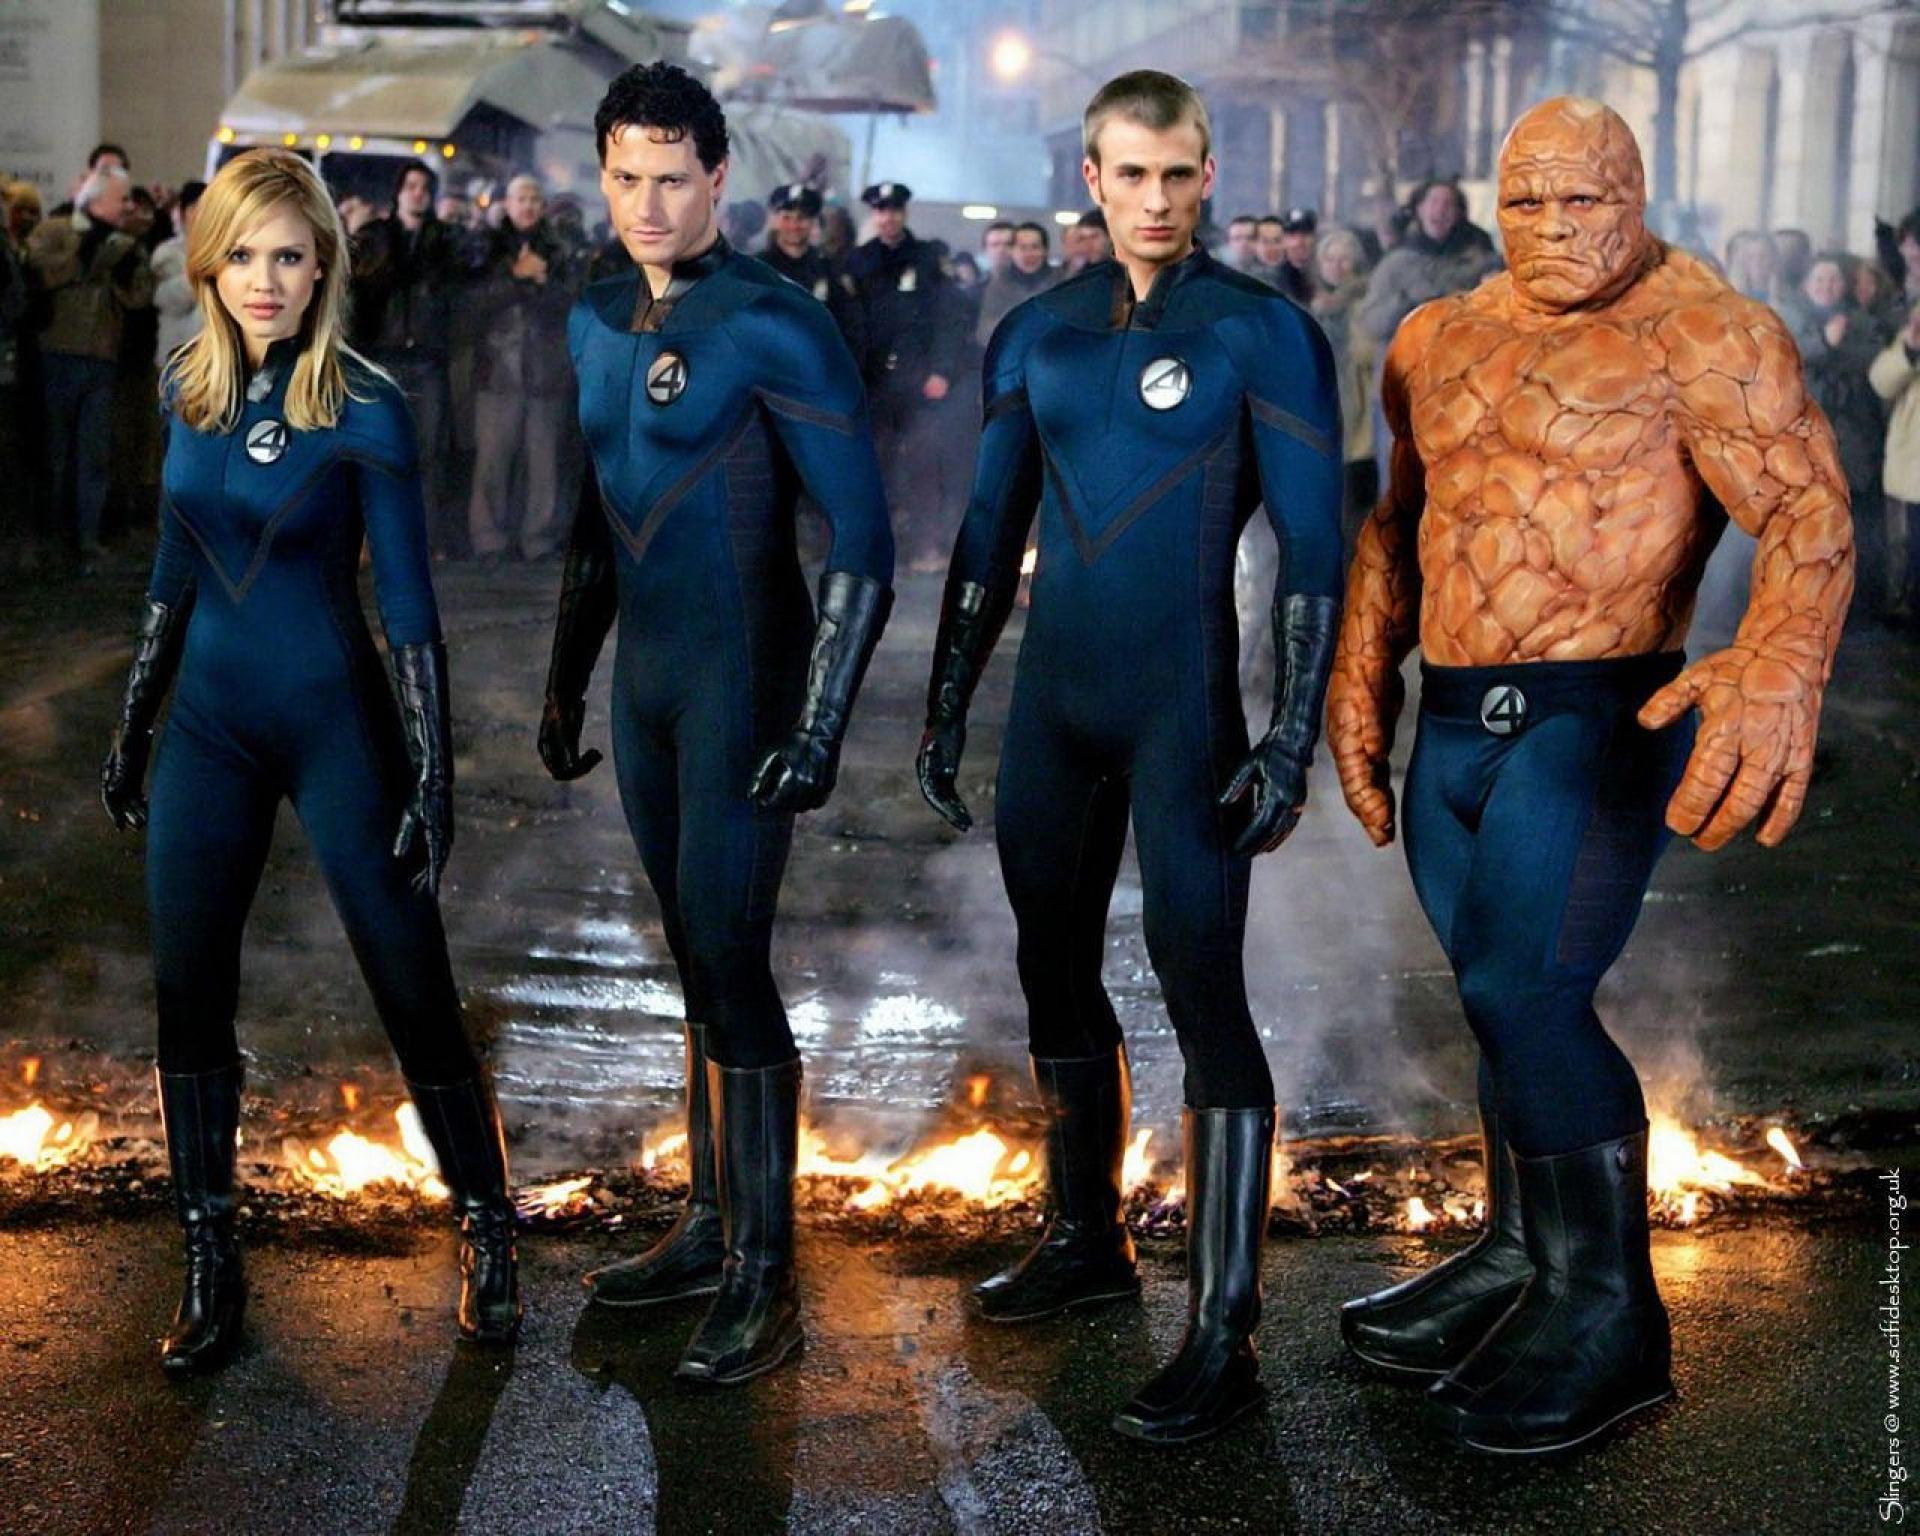 42649-comic-book-movie-flash-back-2005-fantastic-four_1920x1080